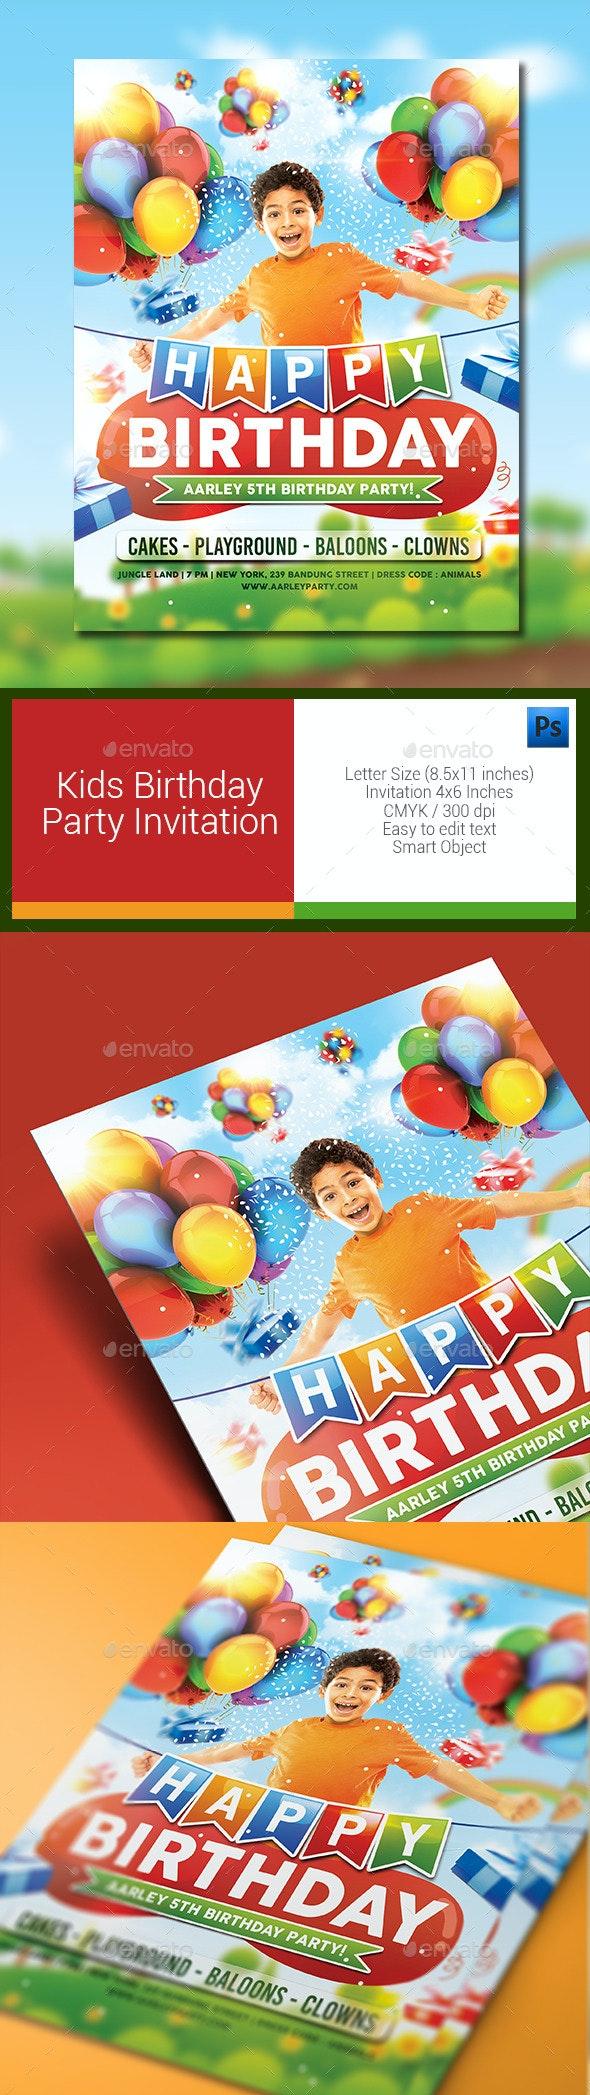 Kids Birthday Party Invitation - Birthday Greeting Cards